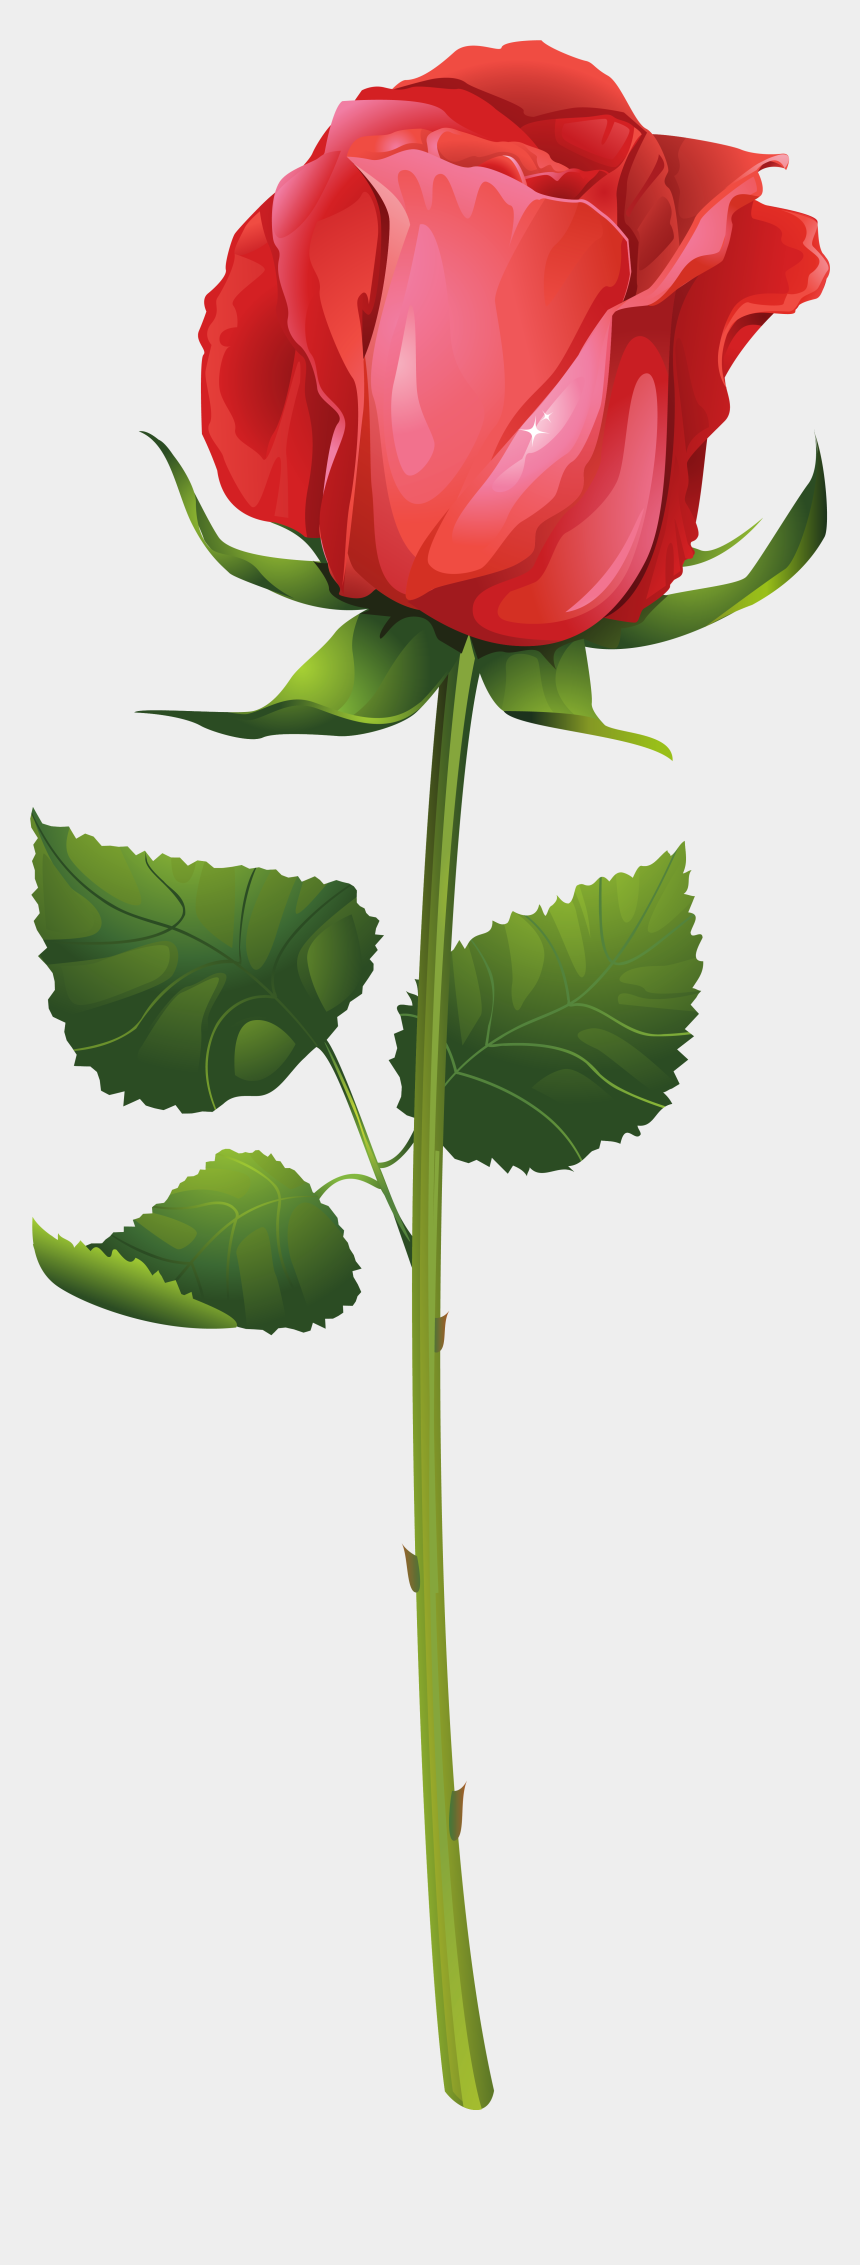 stem clipart, Cartoons - Rose With Stem Png Clip Art Imageu200b Gallery Yopriceville - Red Rose Illustration Vector